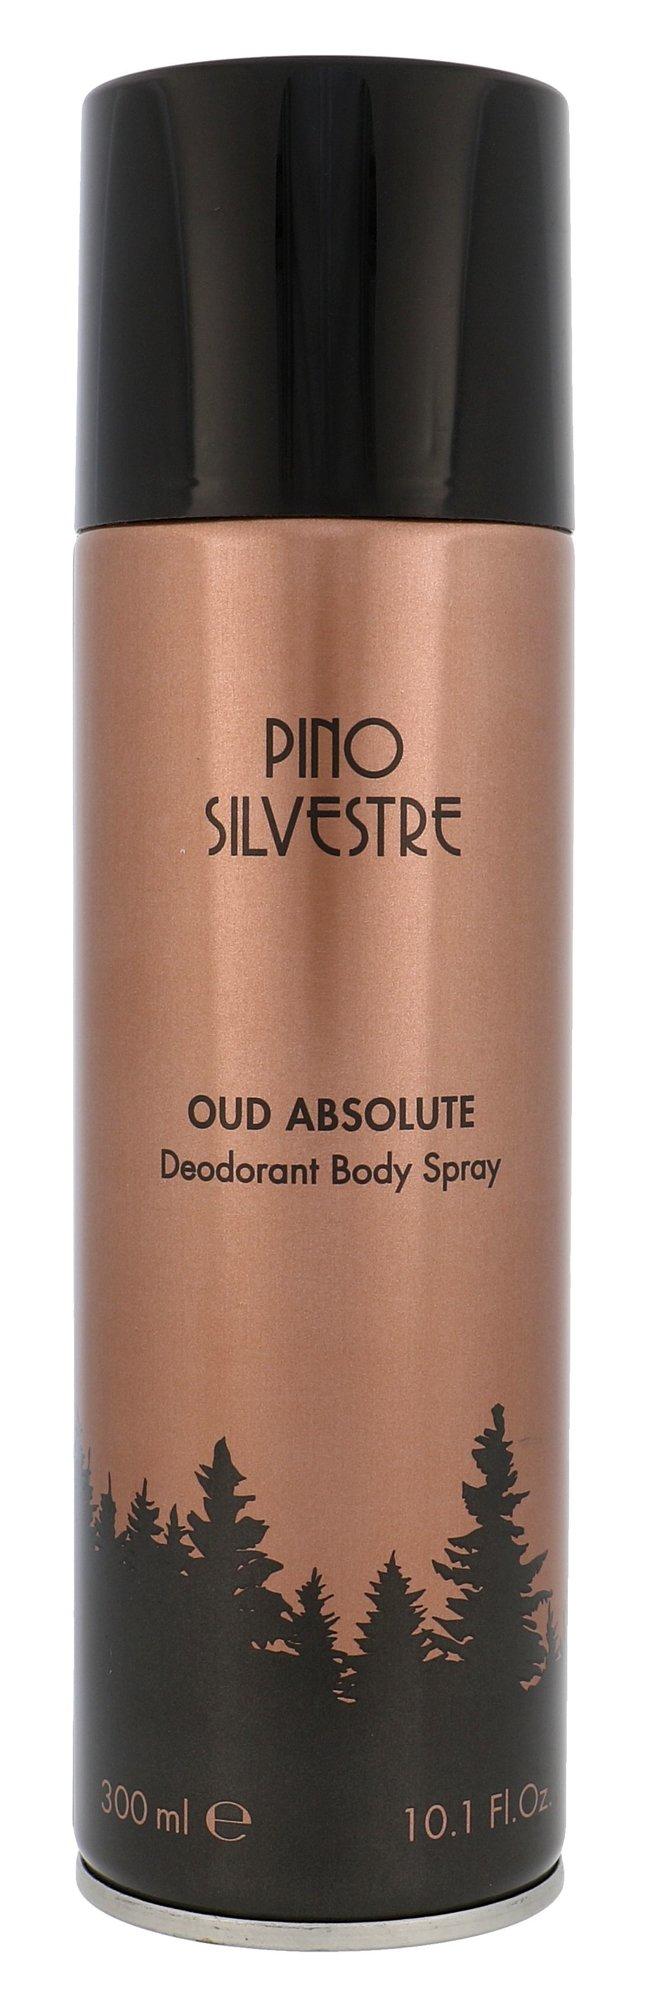 Pino Silvestre Oud Absolute Deodorant 300ml